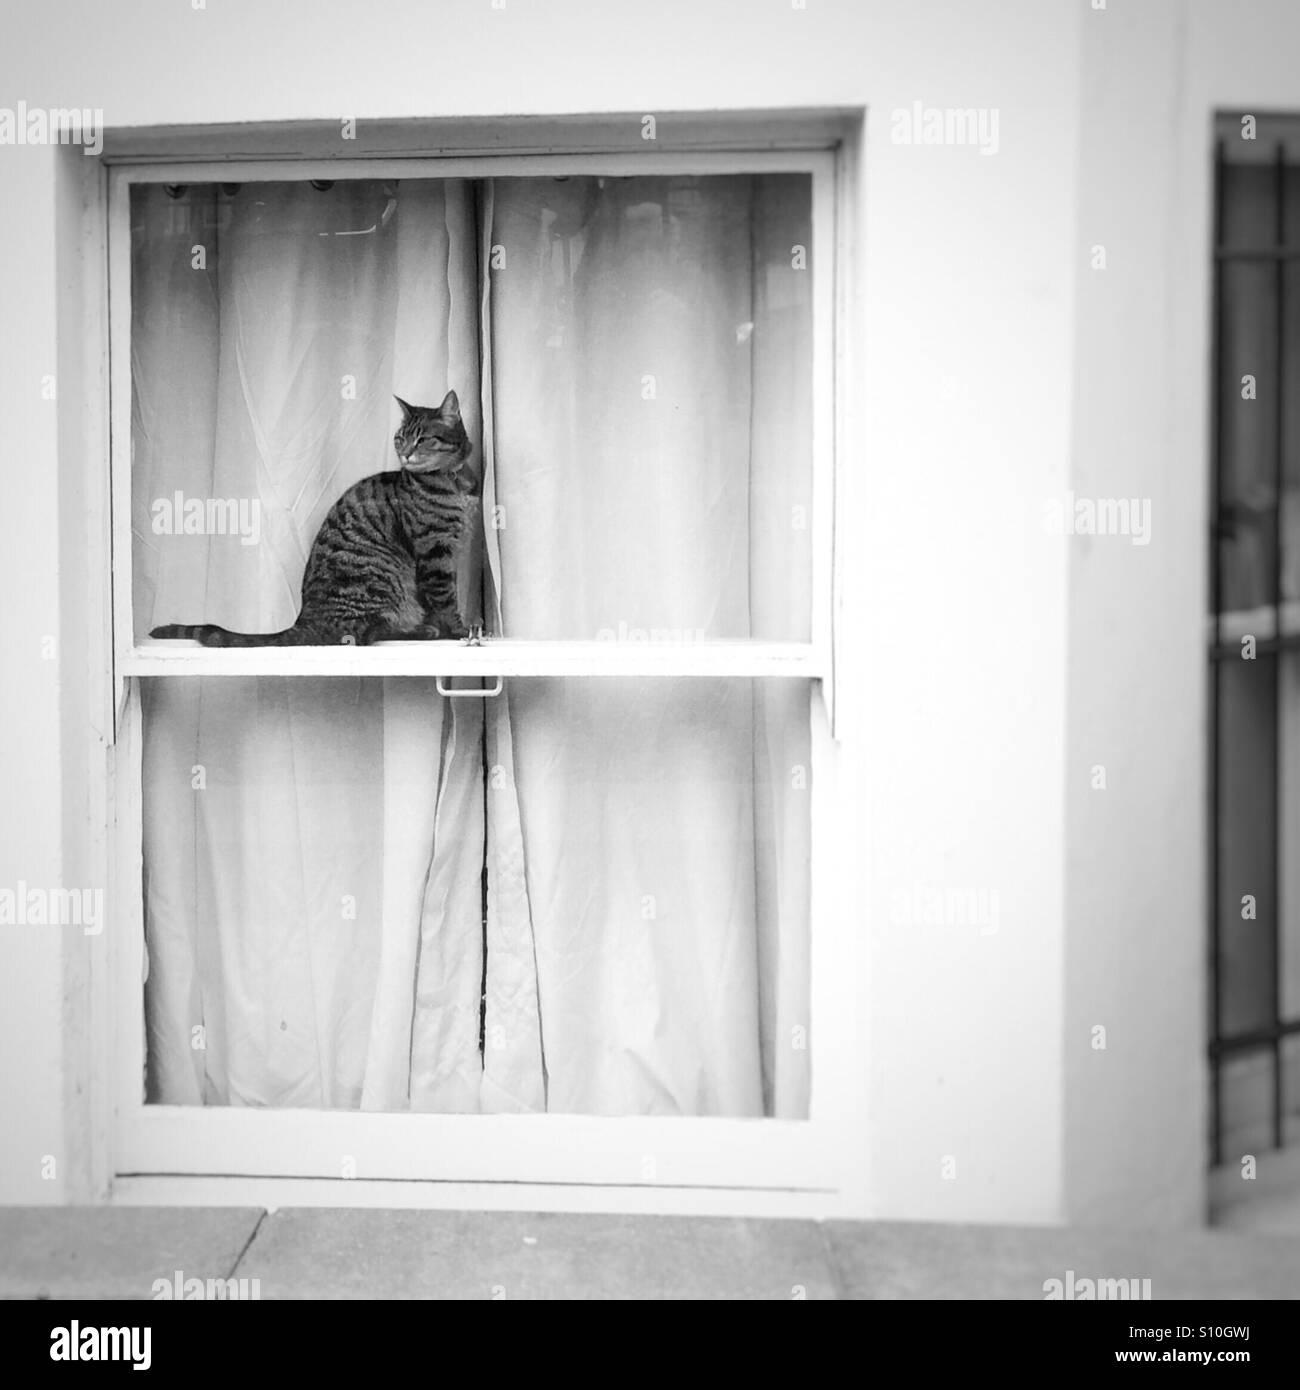 Notting Hill Cat - Stock Image